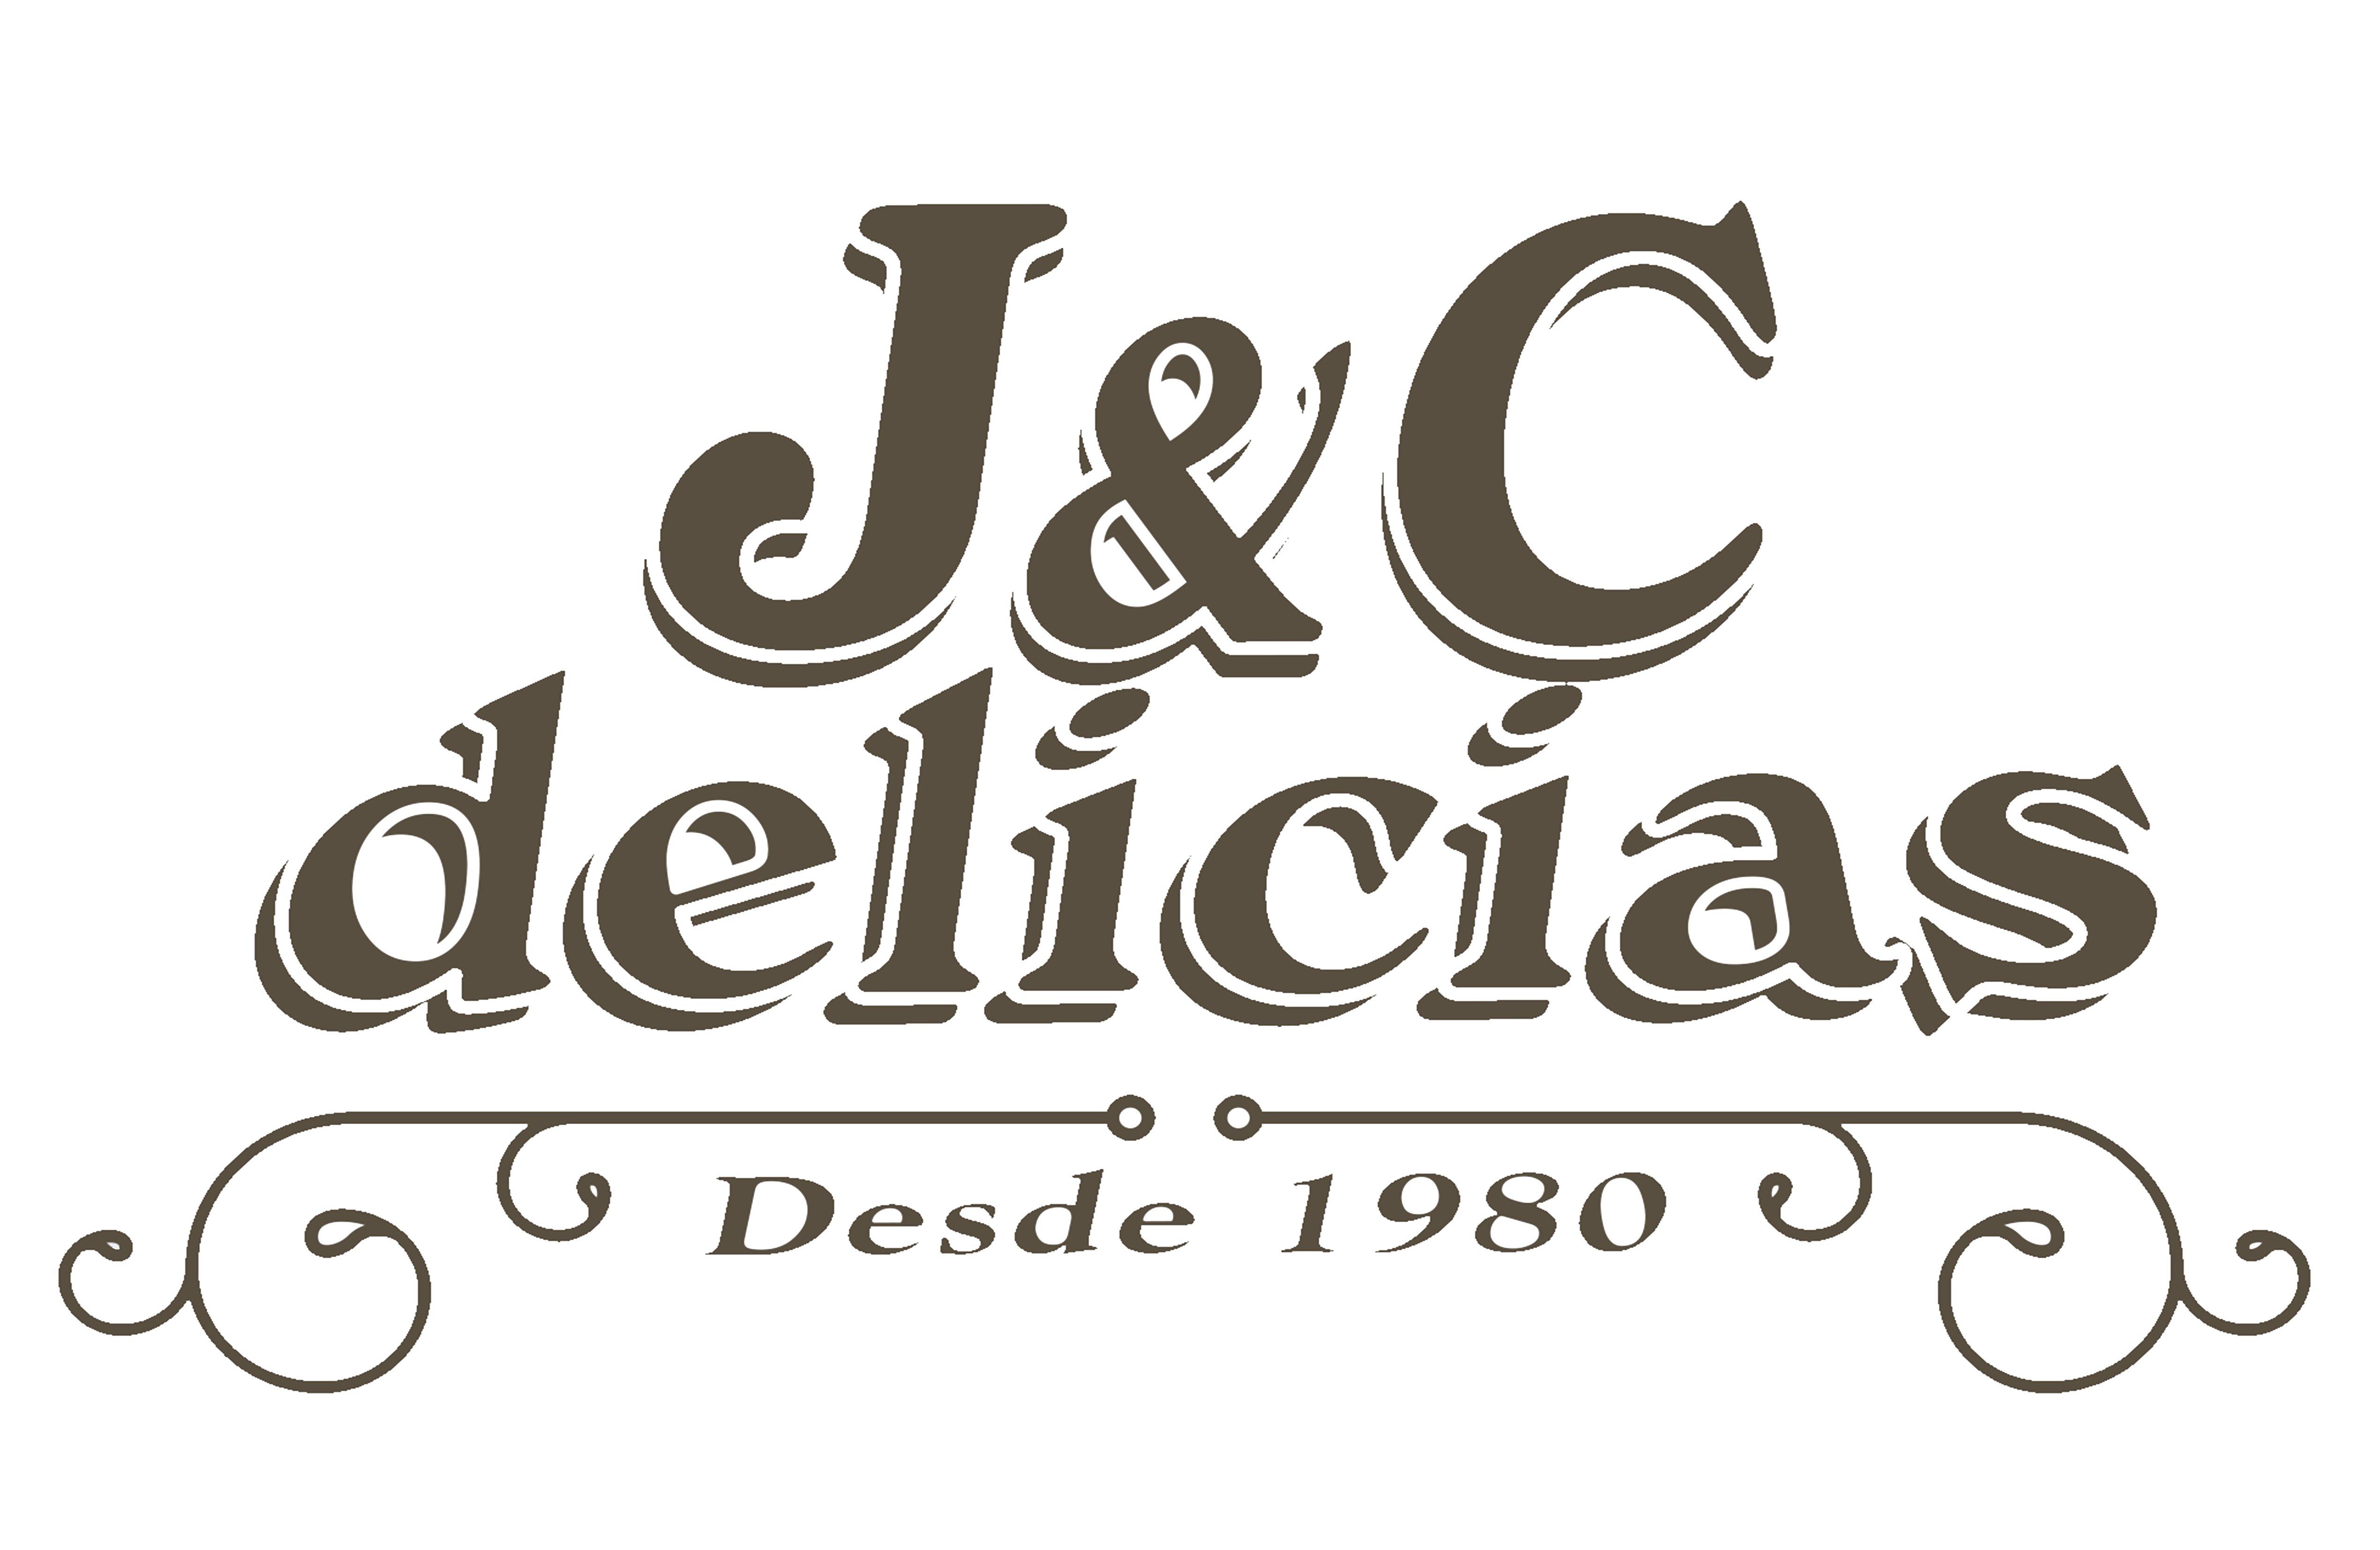 J&C Delicias Centro Comercial Oviedo